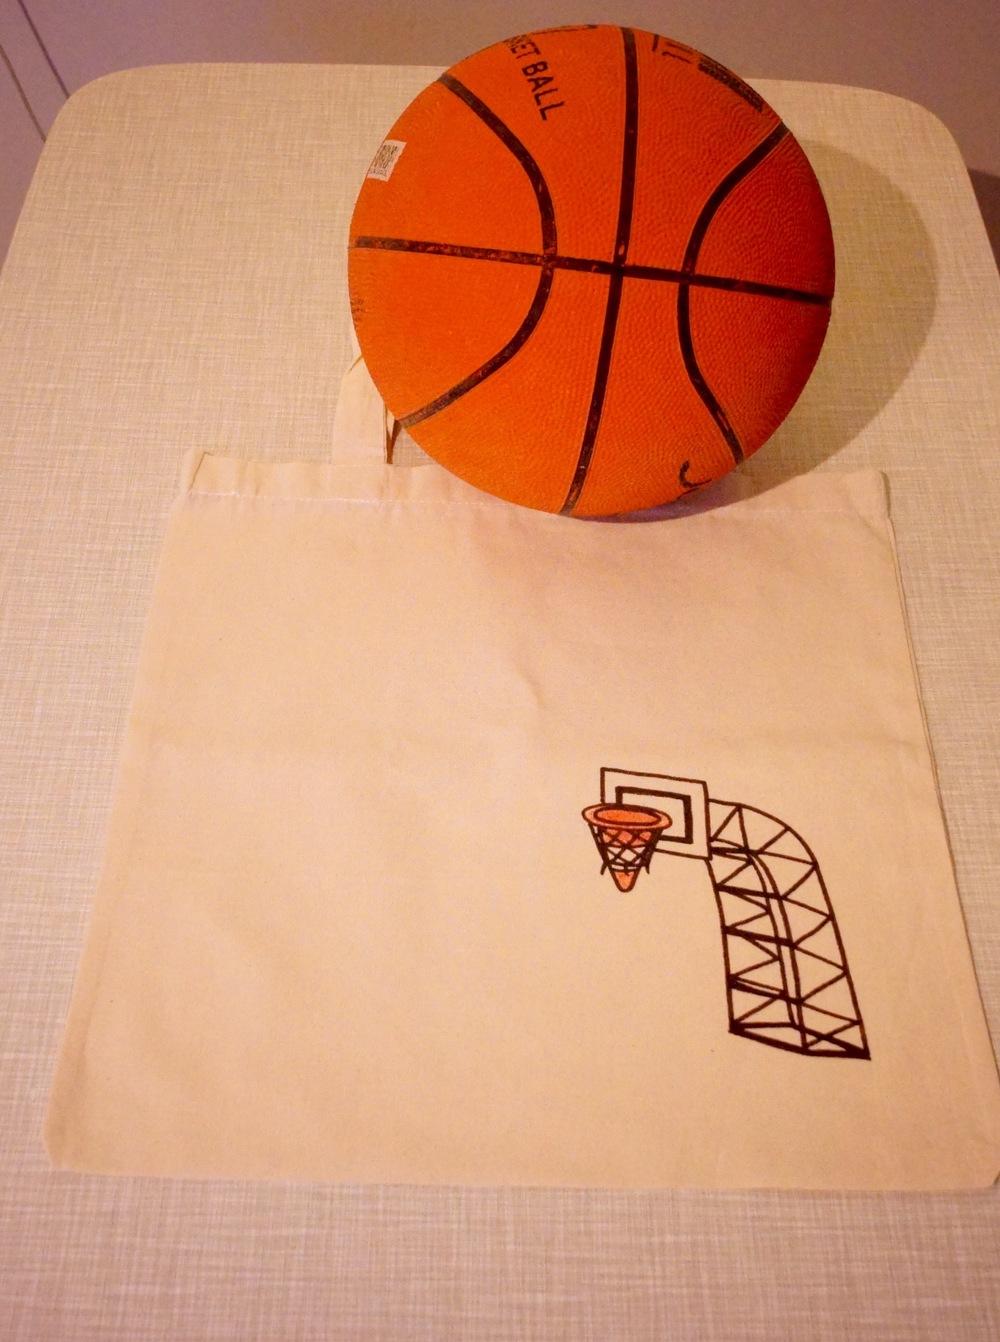 An extremesports bag.